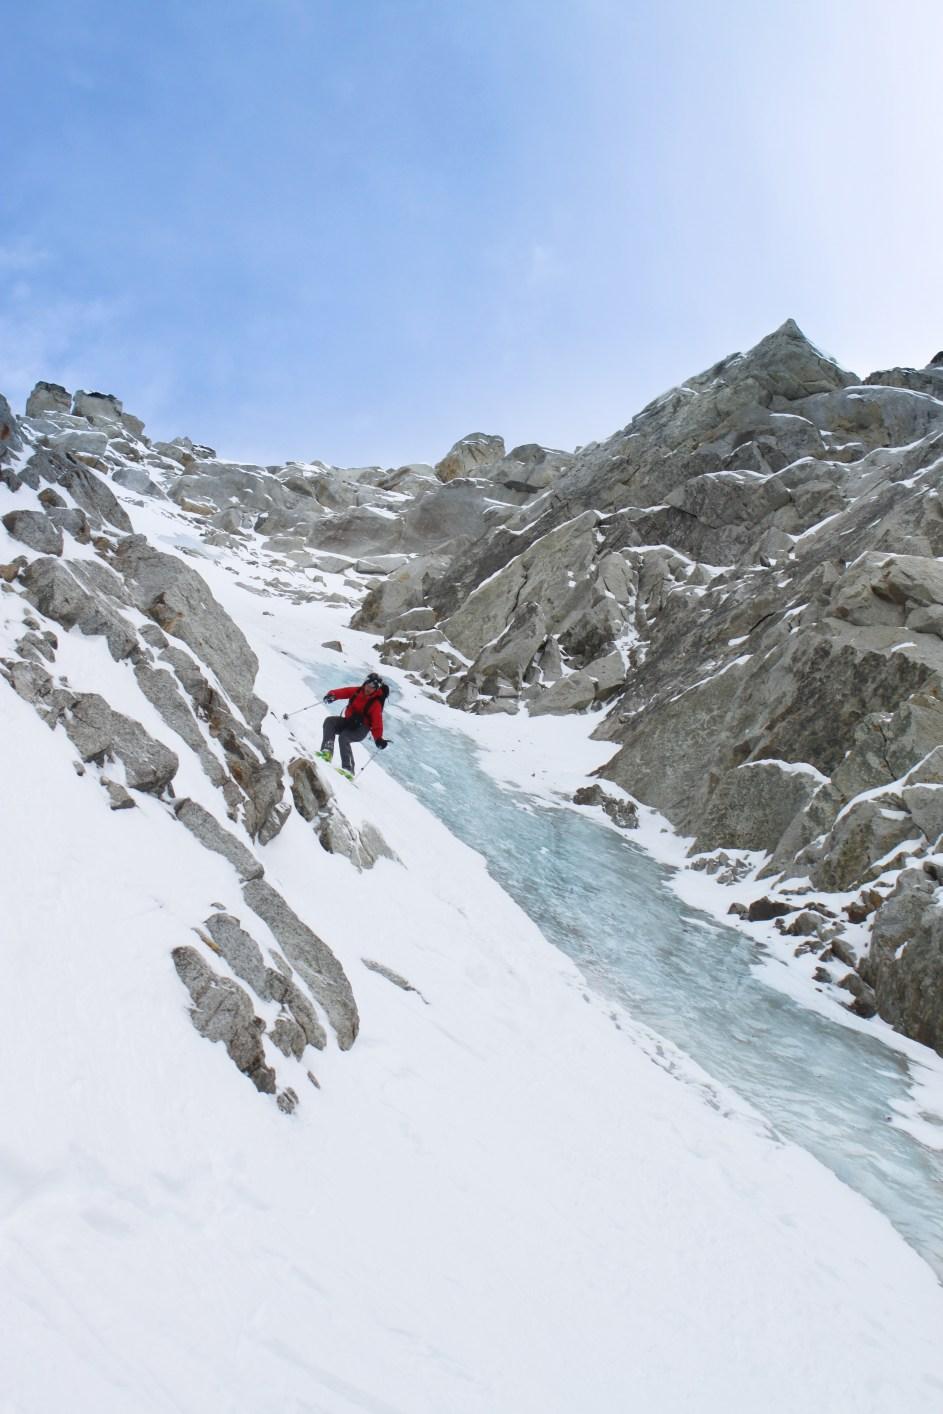 Skiing In The Revelation Mountains, AK.